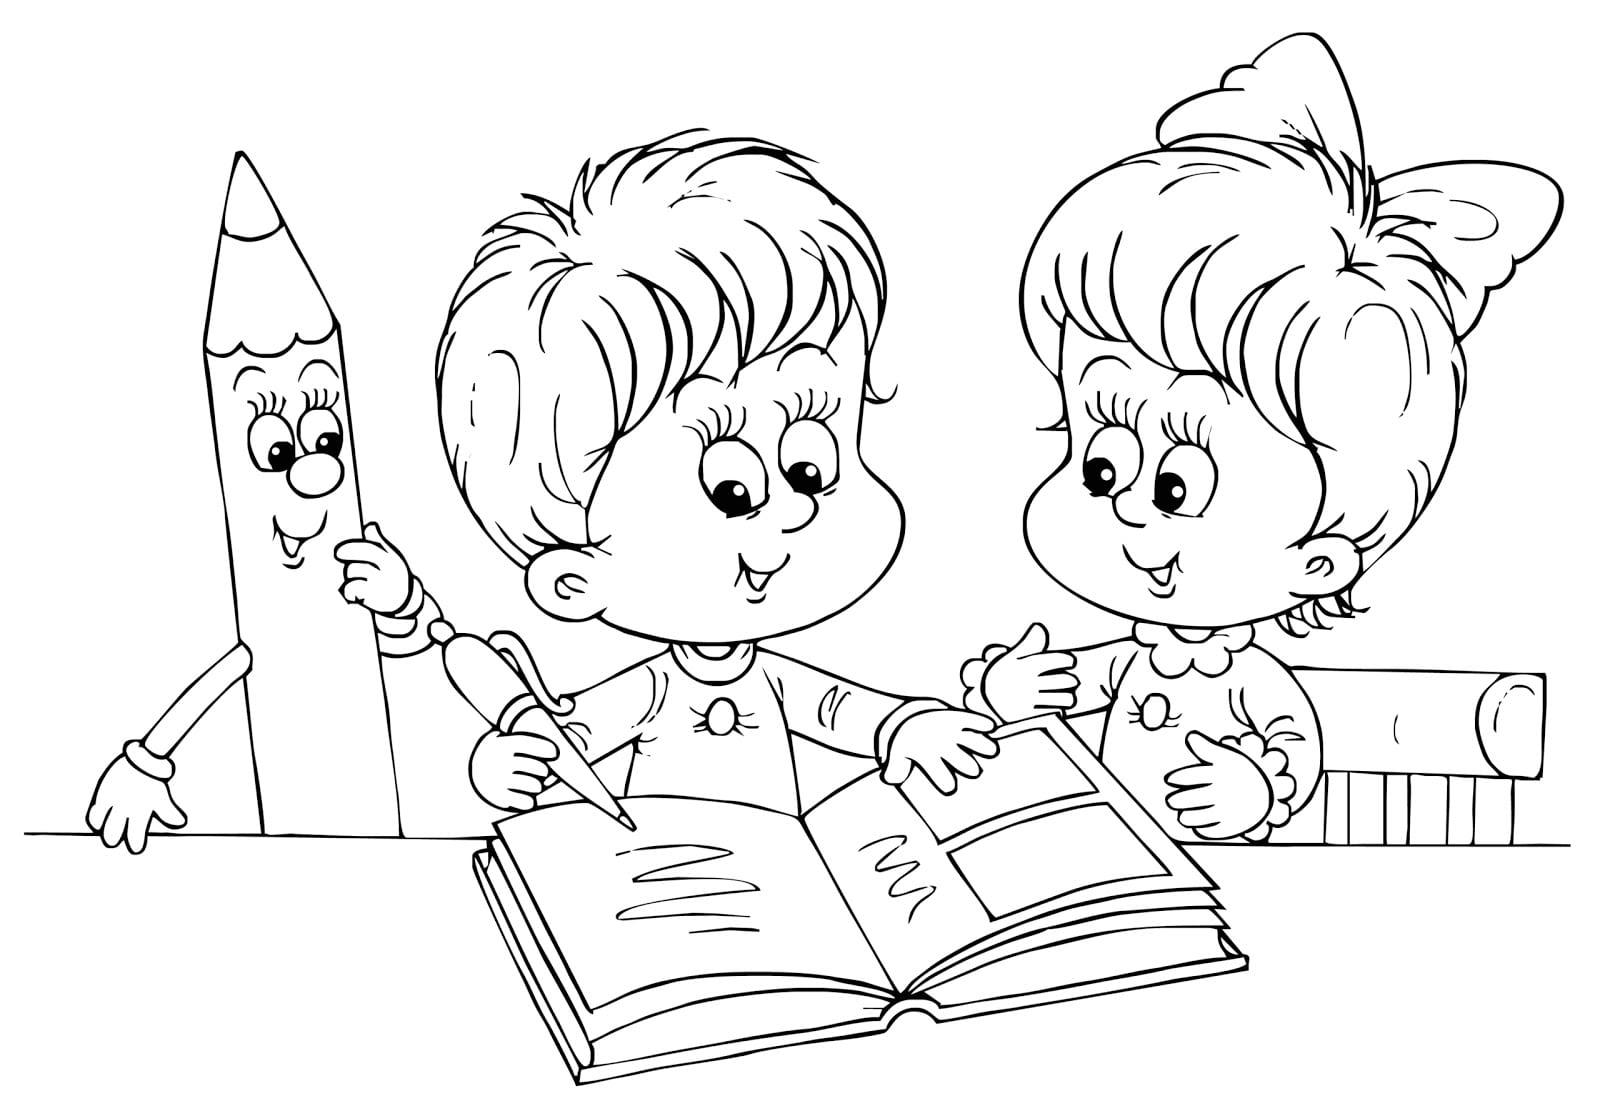 Desenhos De Crian As Estudando Para Colorir